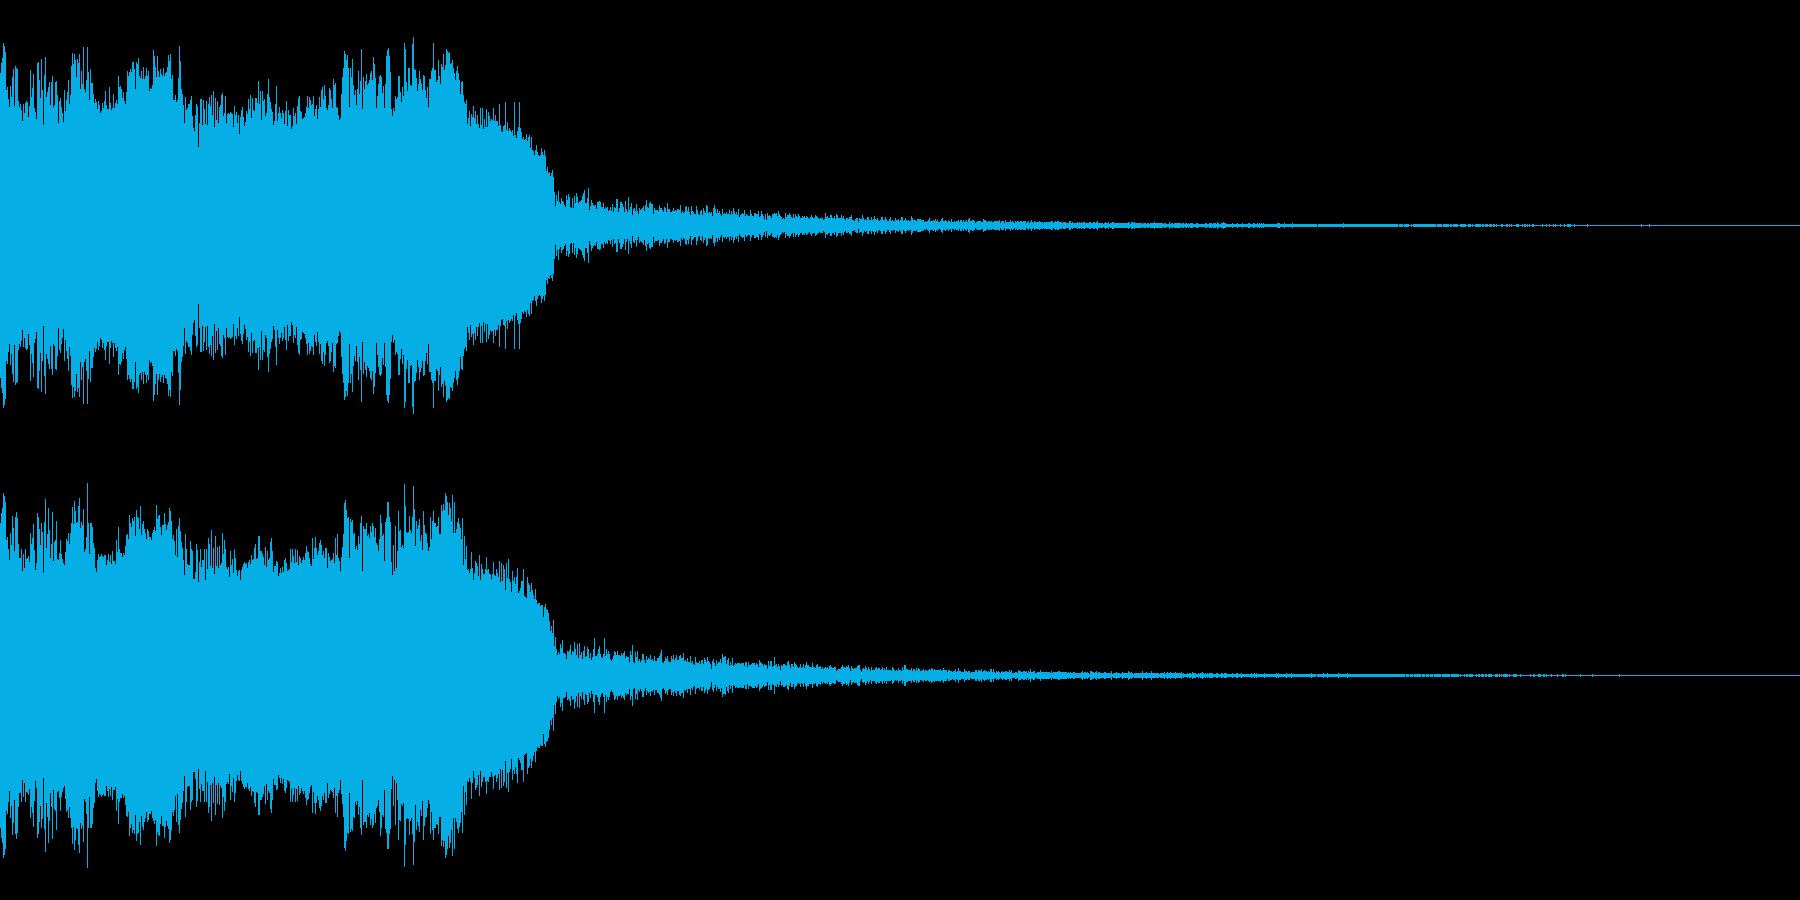 DJFX ヒットチャート発表前SE 20の再生済みの波形